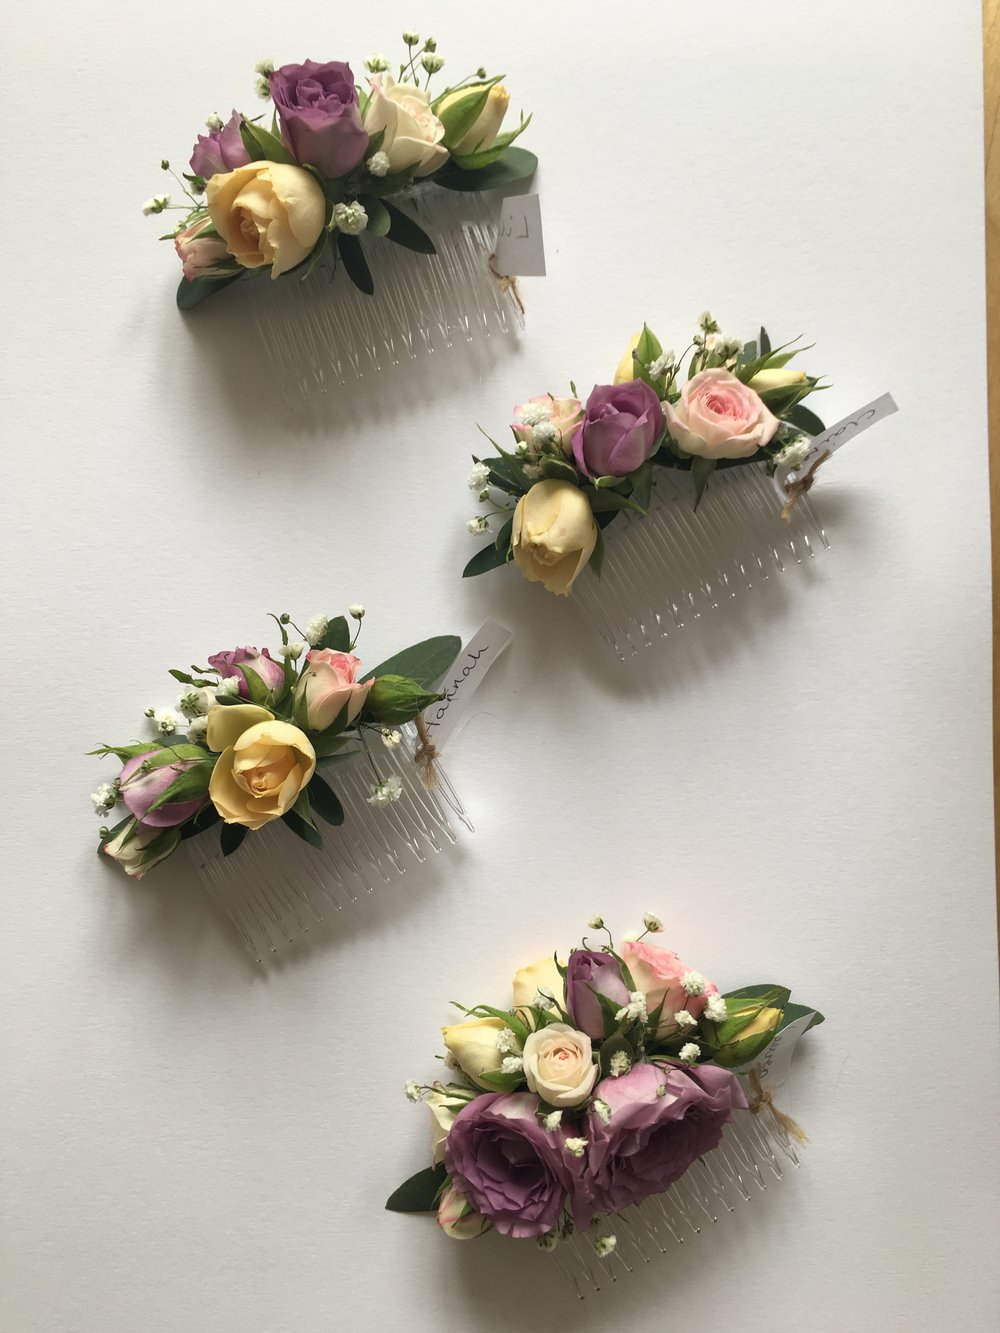 Wedding-Flowers-Brighton-Sussex-Florist-Bridal-Webb-and-Farrer (4).JPG